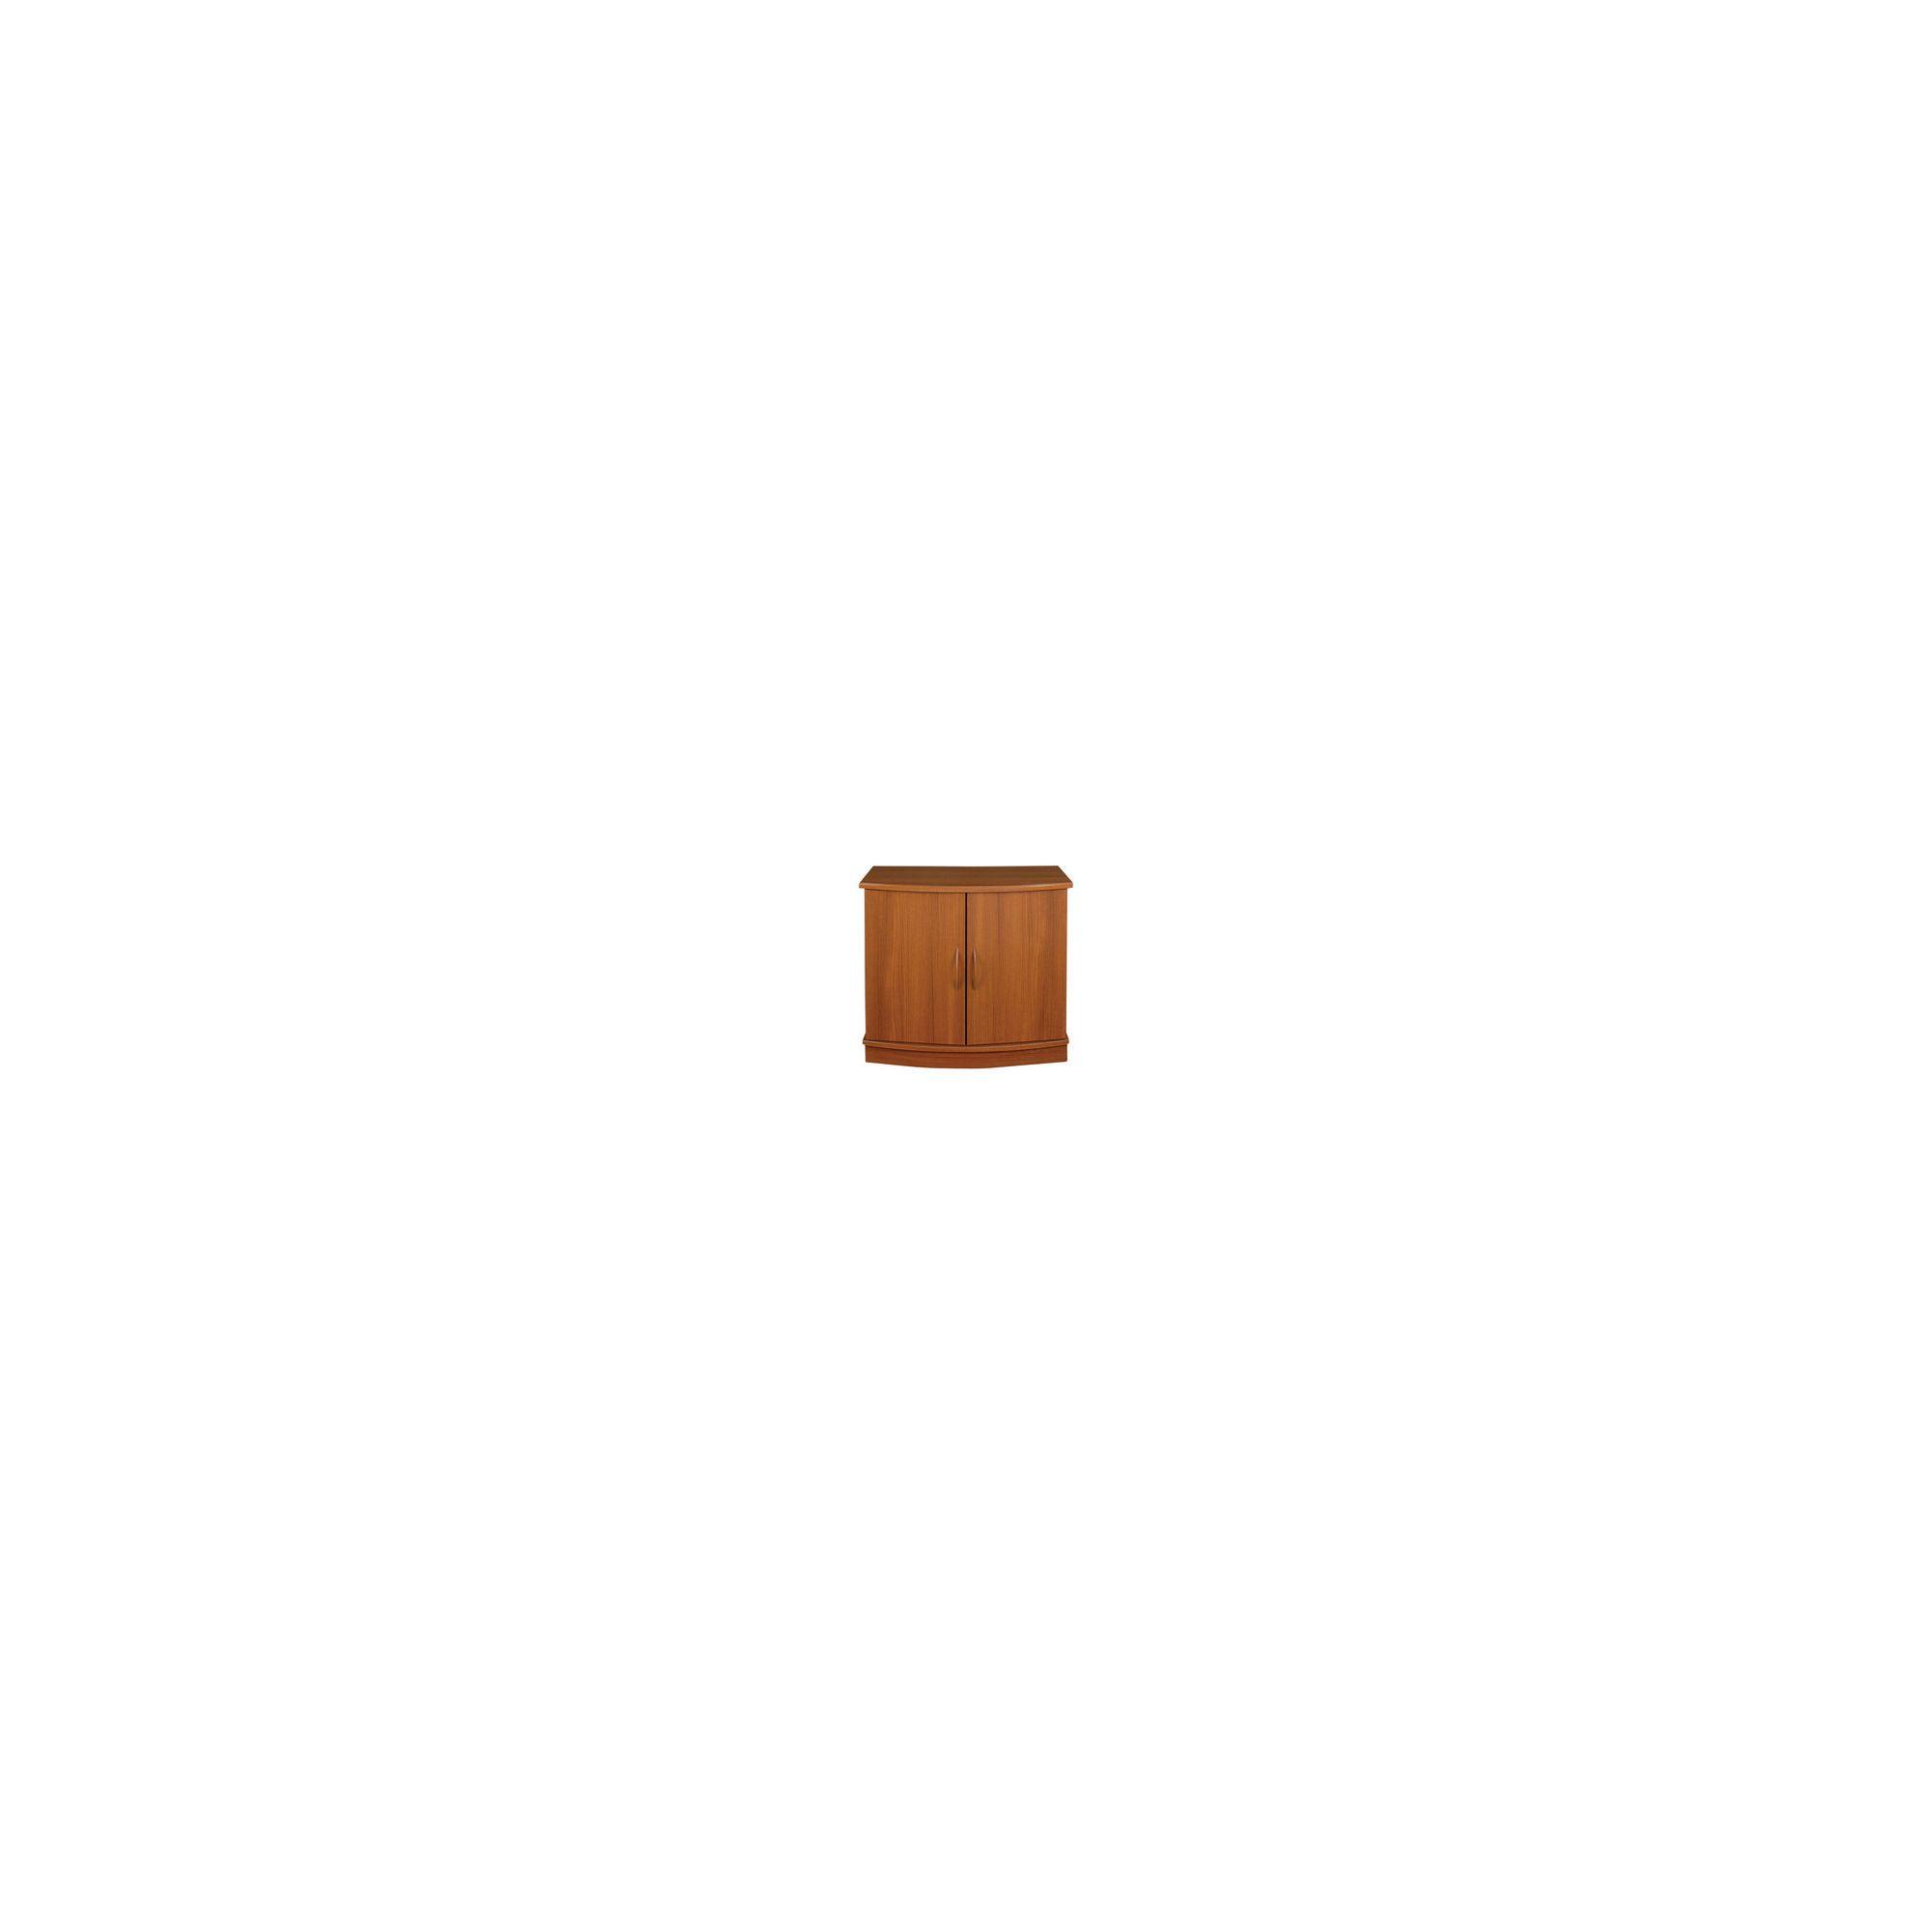 Caxton Delta Two Door Sideboard in Teak at Tescos Direct